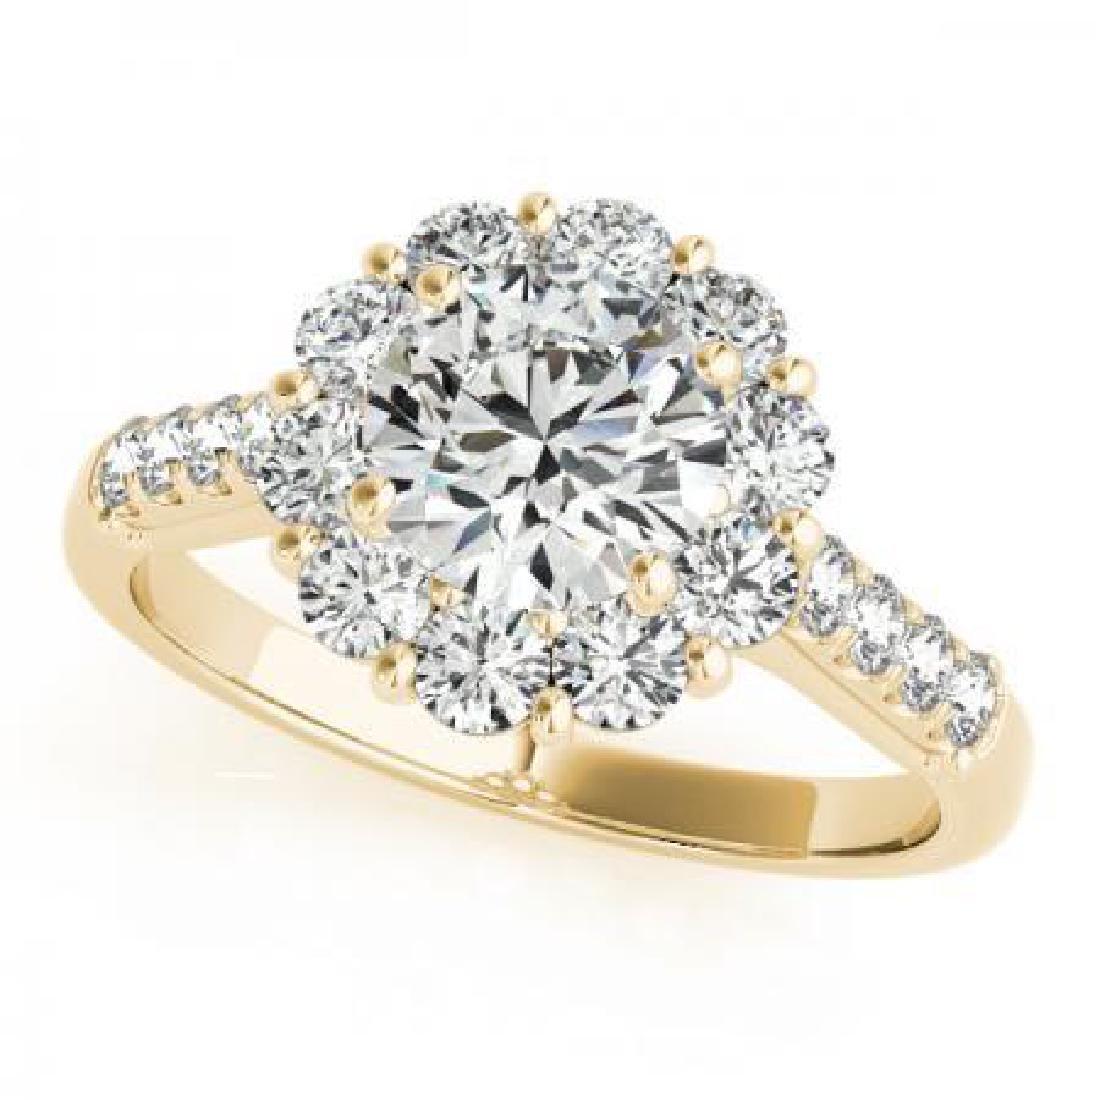 CERTIFIED 18K YELLOW GOLD 2.12 CT G-H/VS-SI1 DIAMOND HA